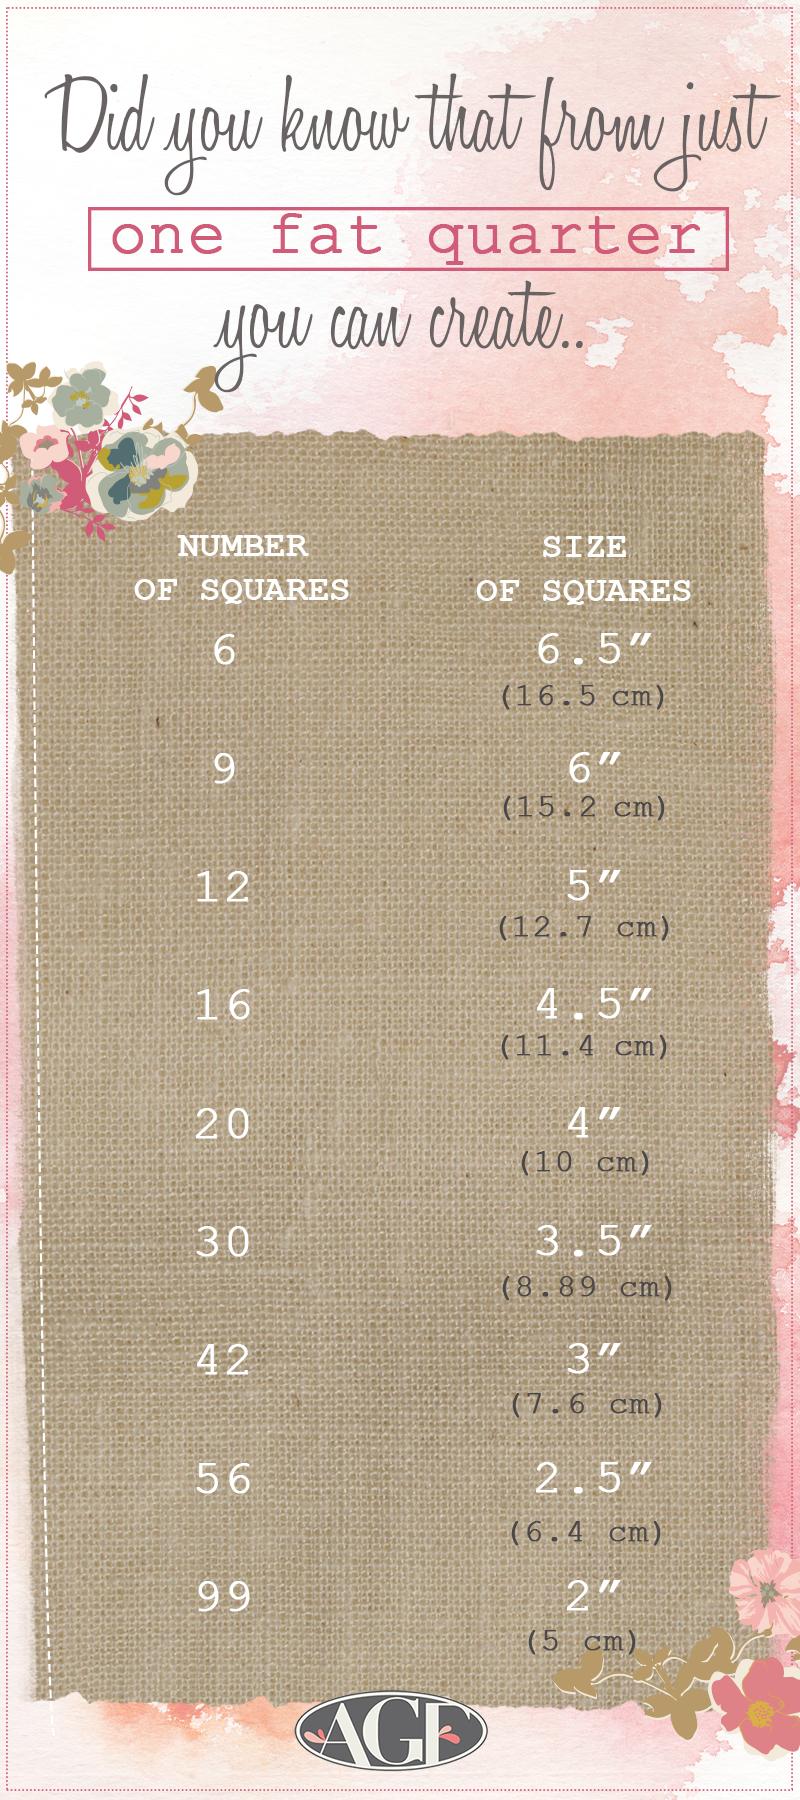 Fat quarter chart